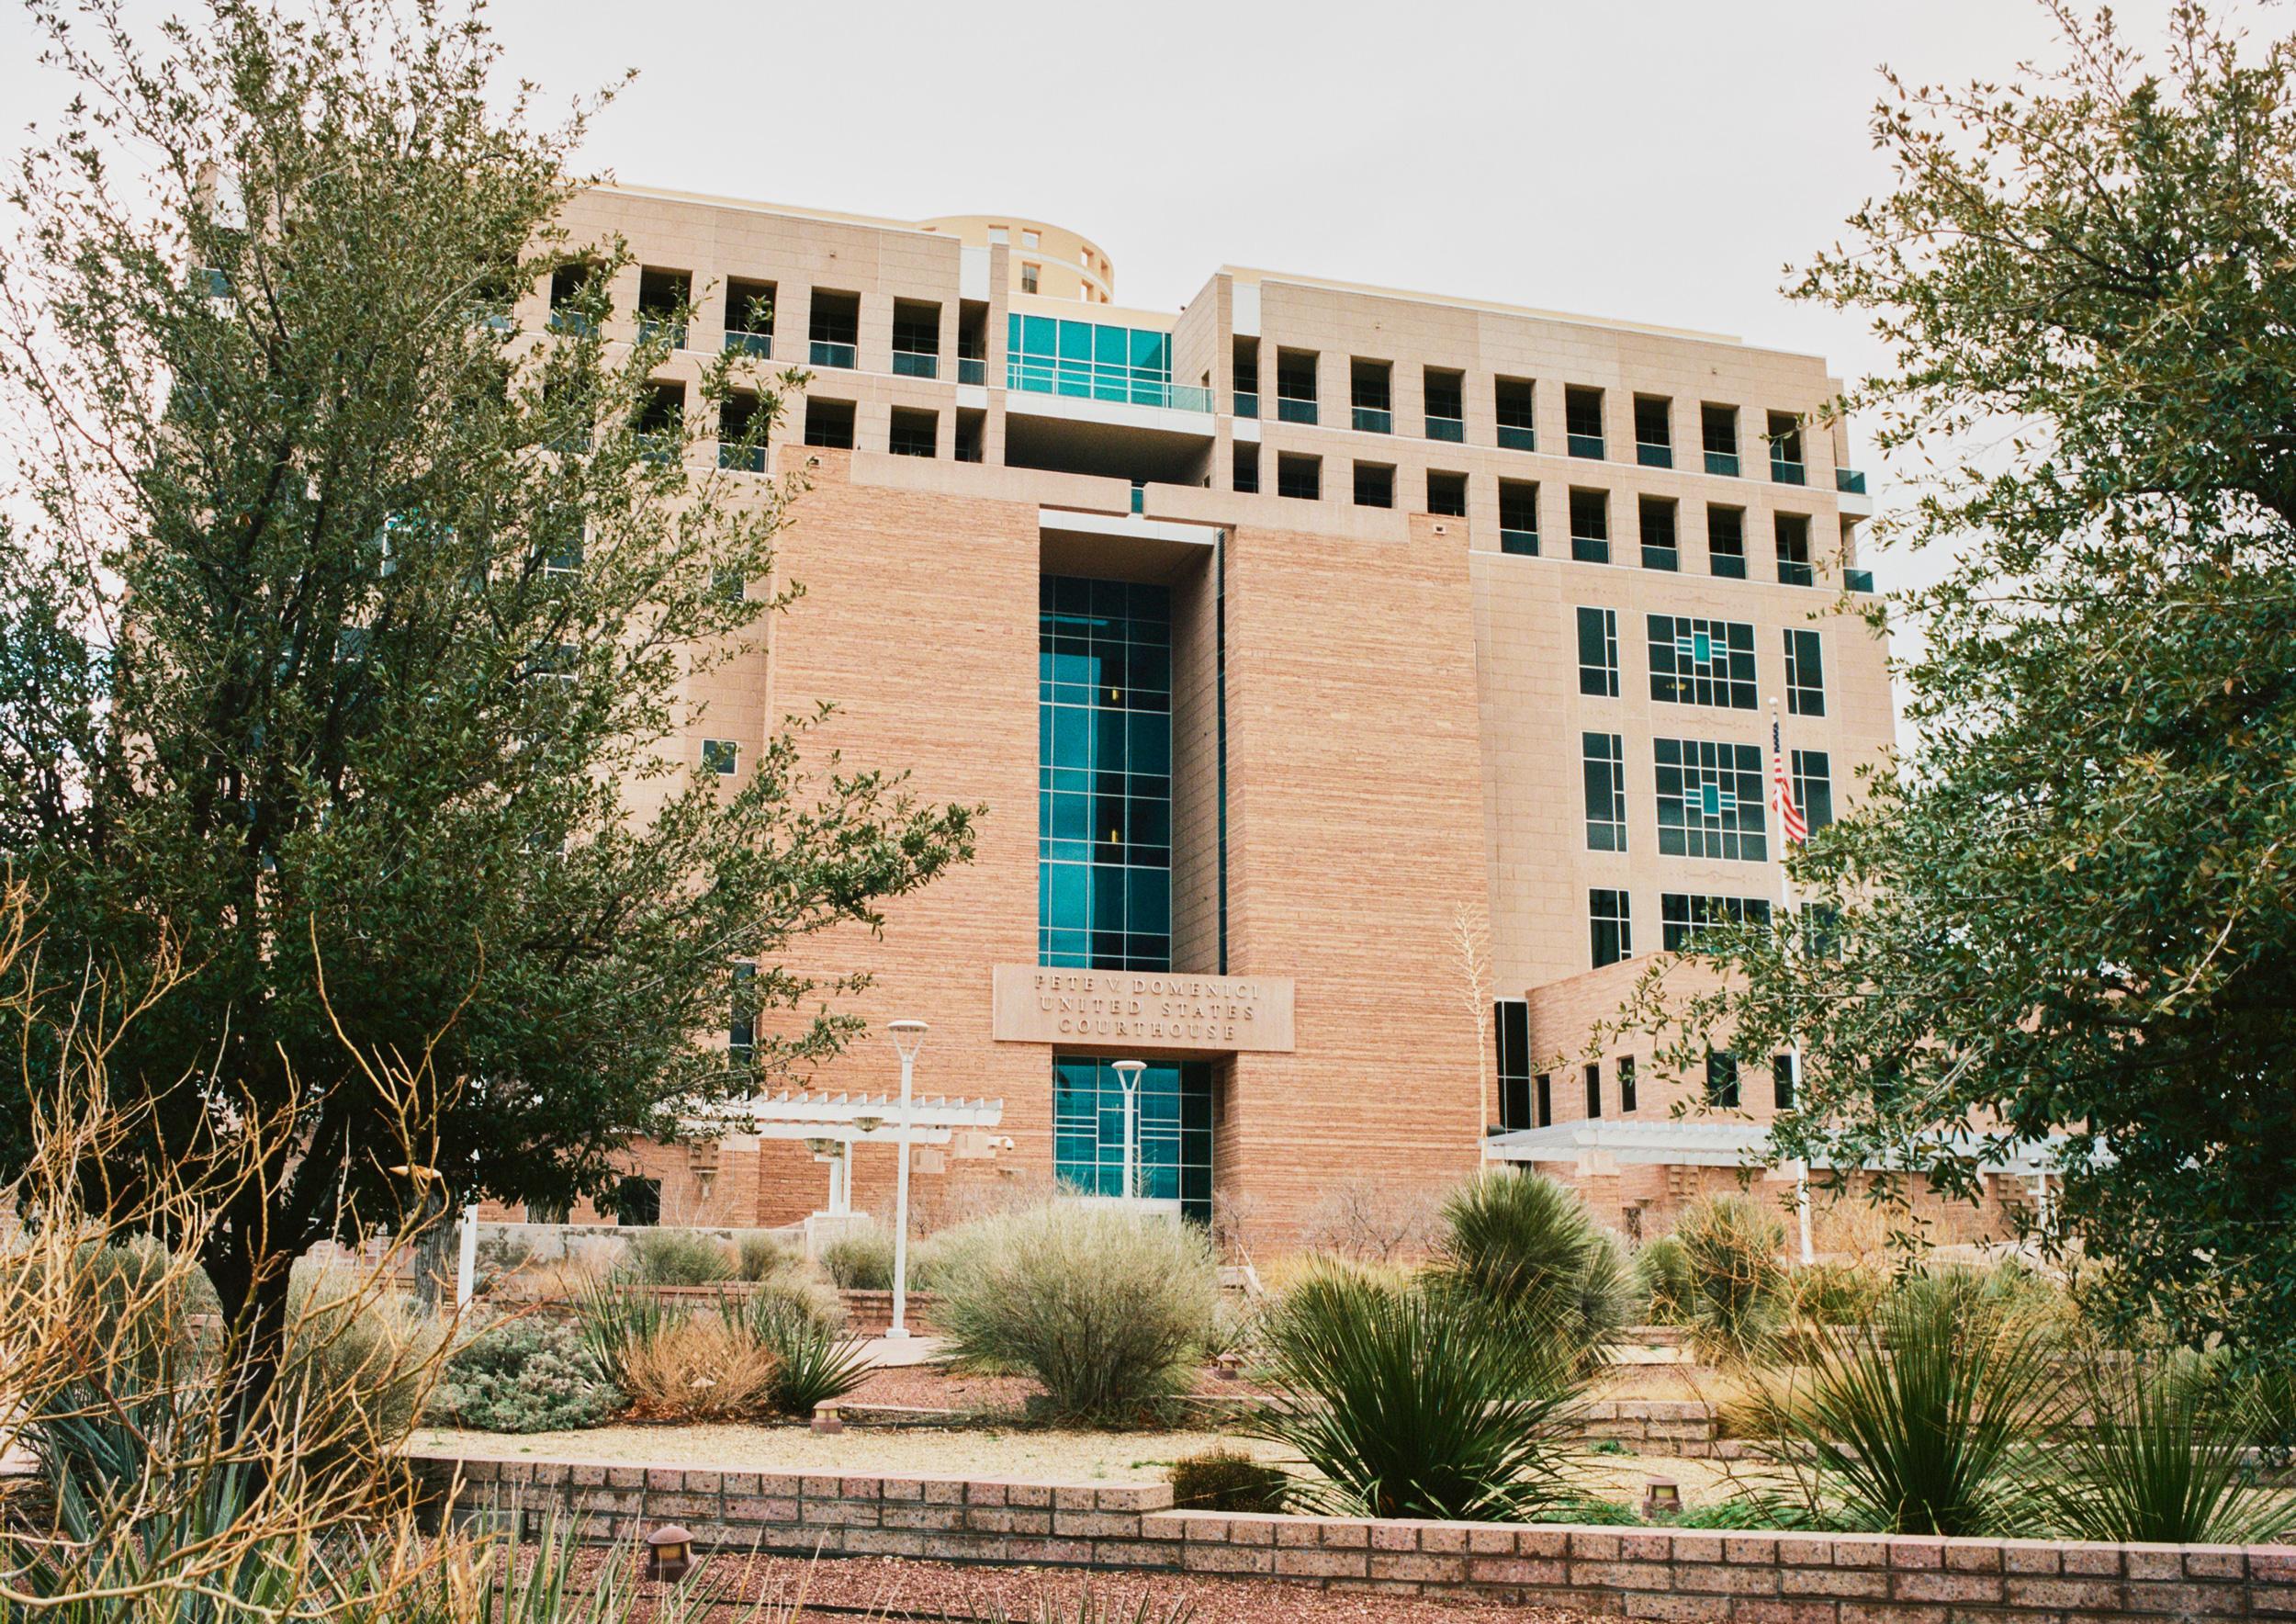 Albuquerque Federal Courthouse Building